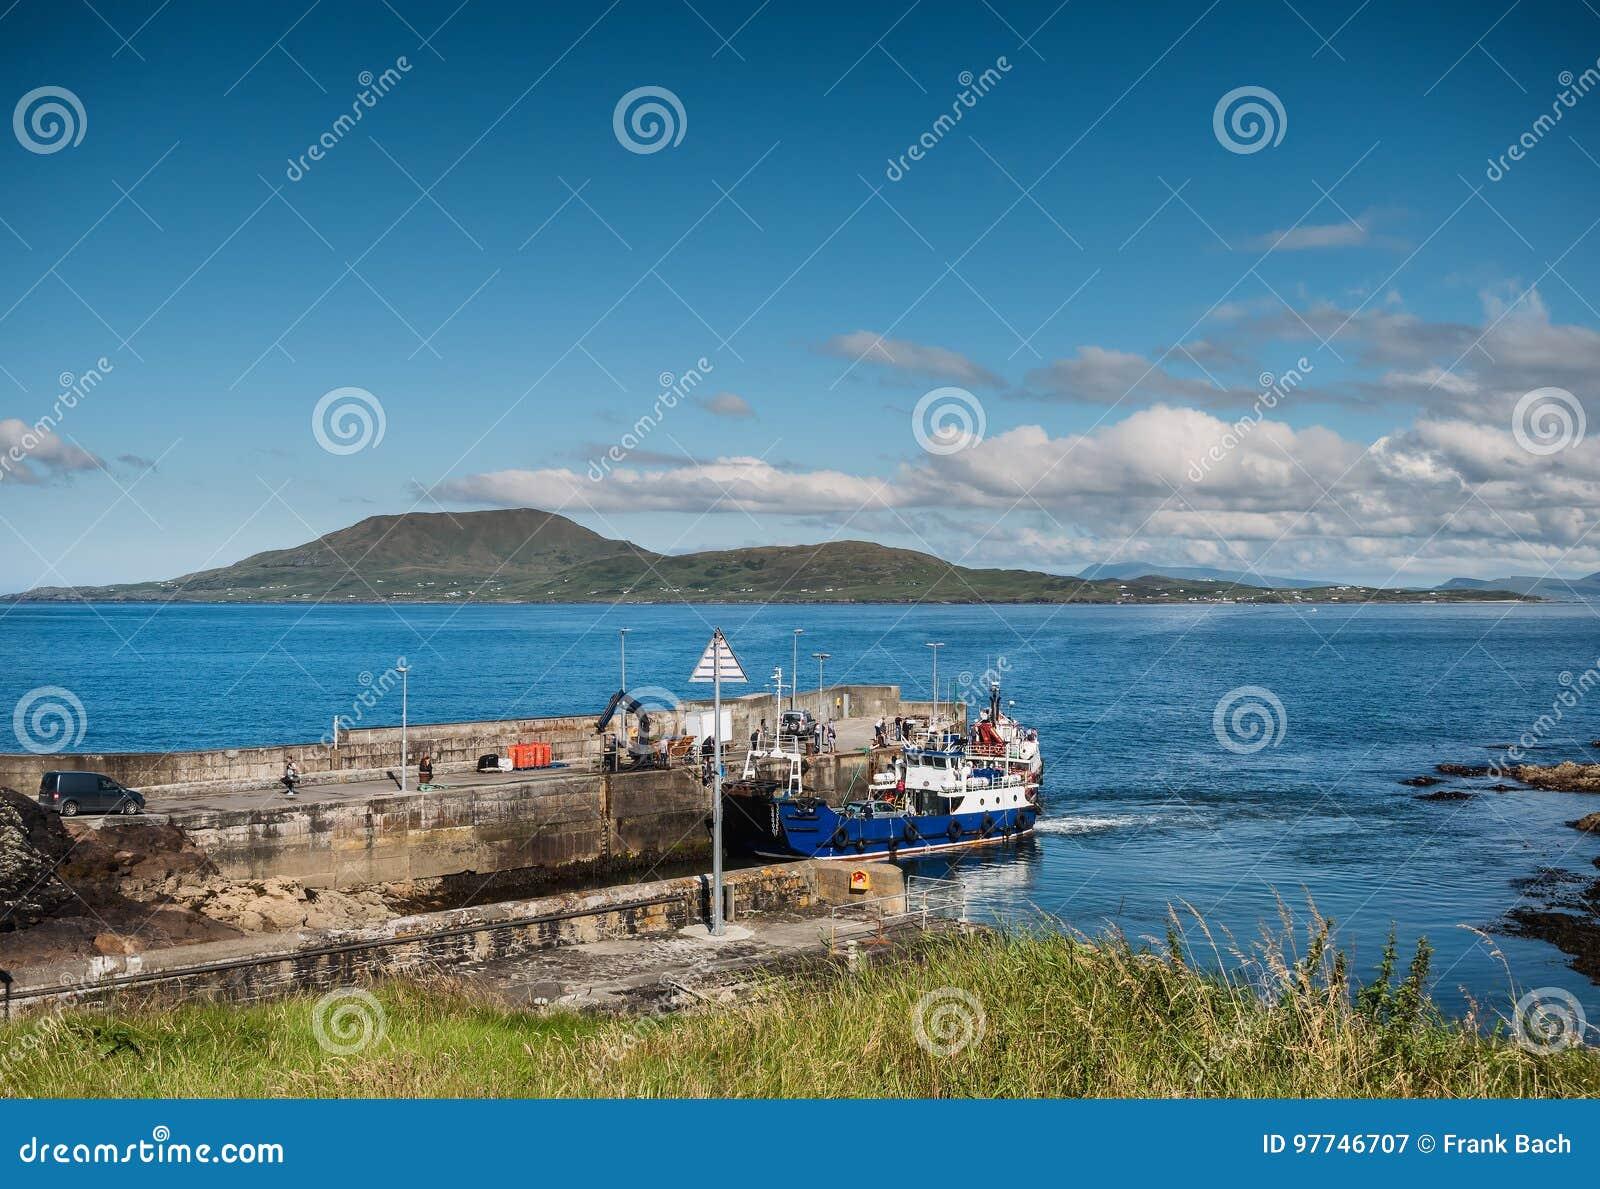 Clare Island visto da Roonah Quay in contea Mayo, Irlanda